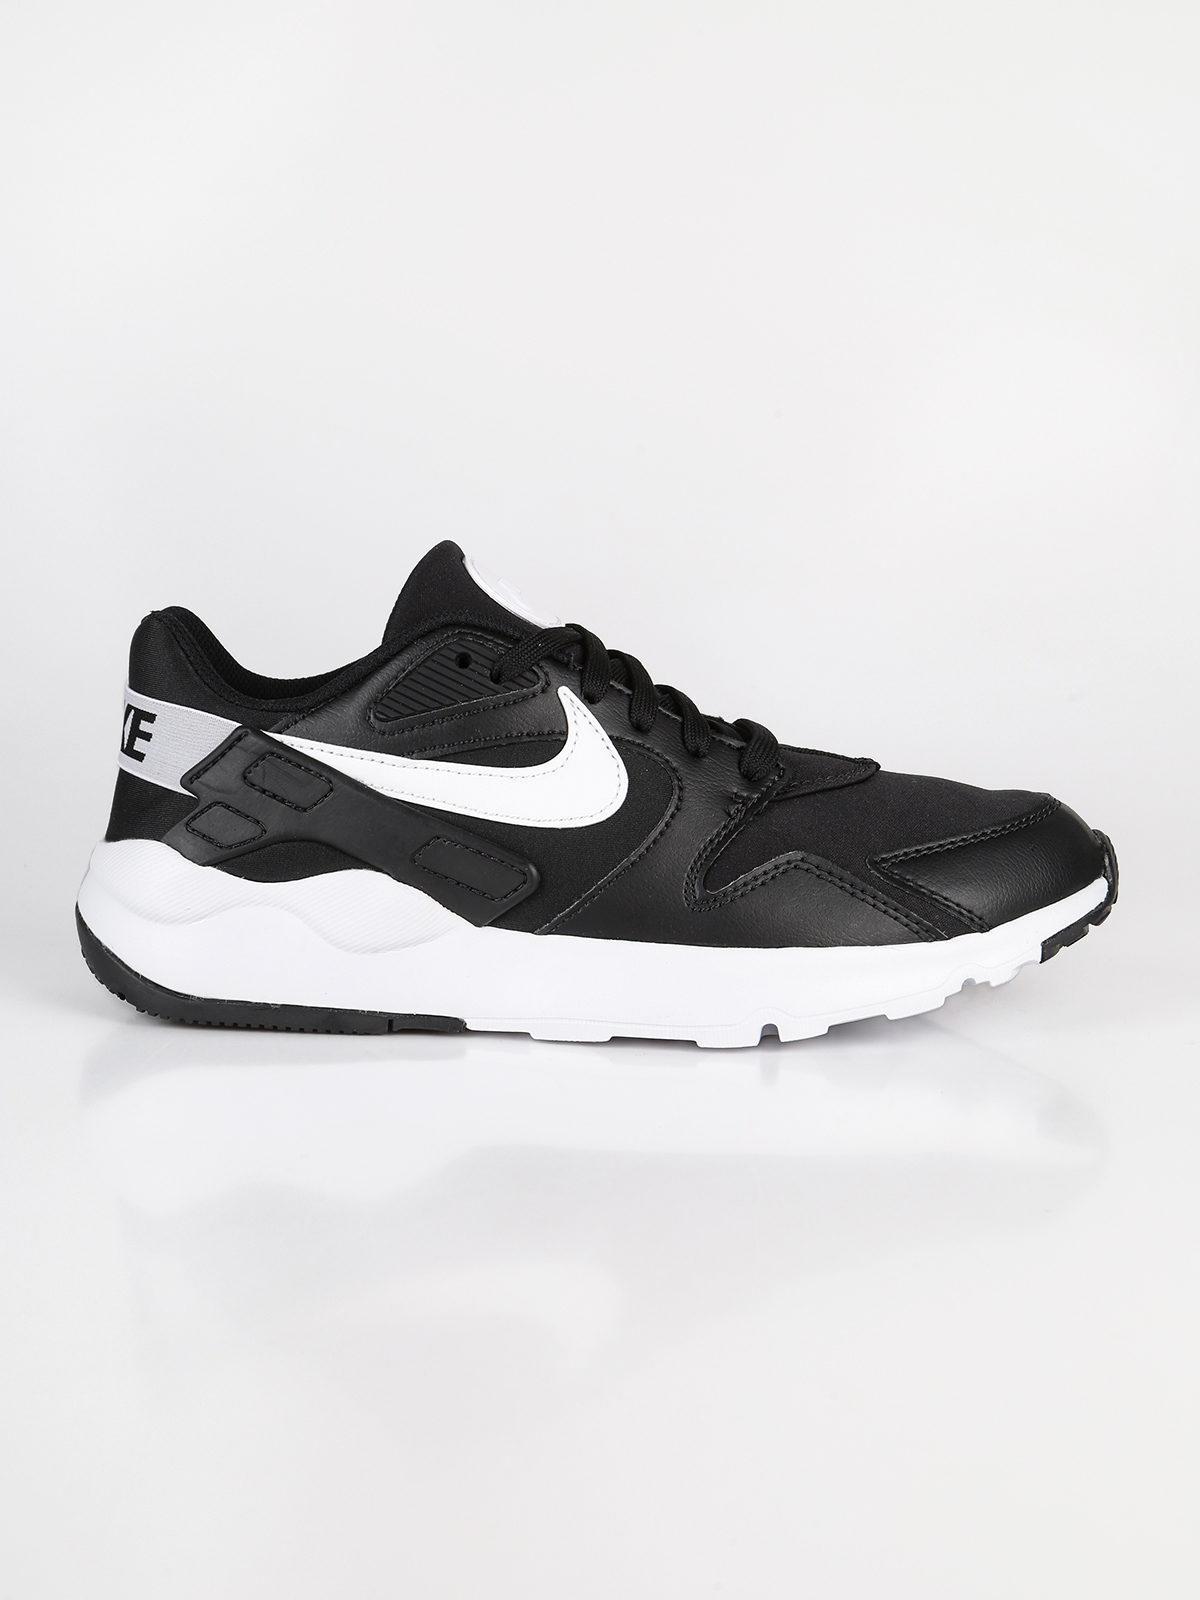 nike sportswear bianche e nere